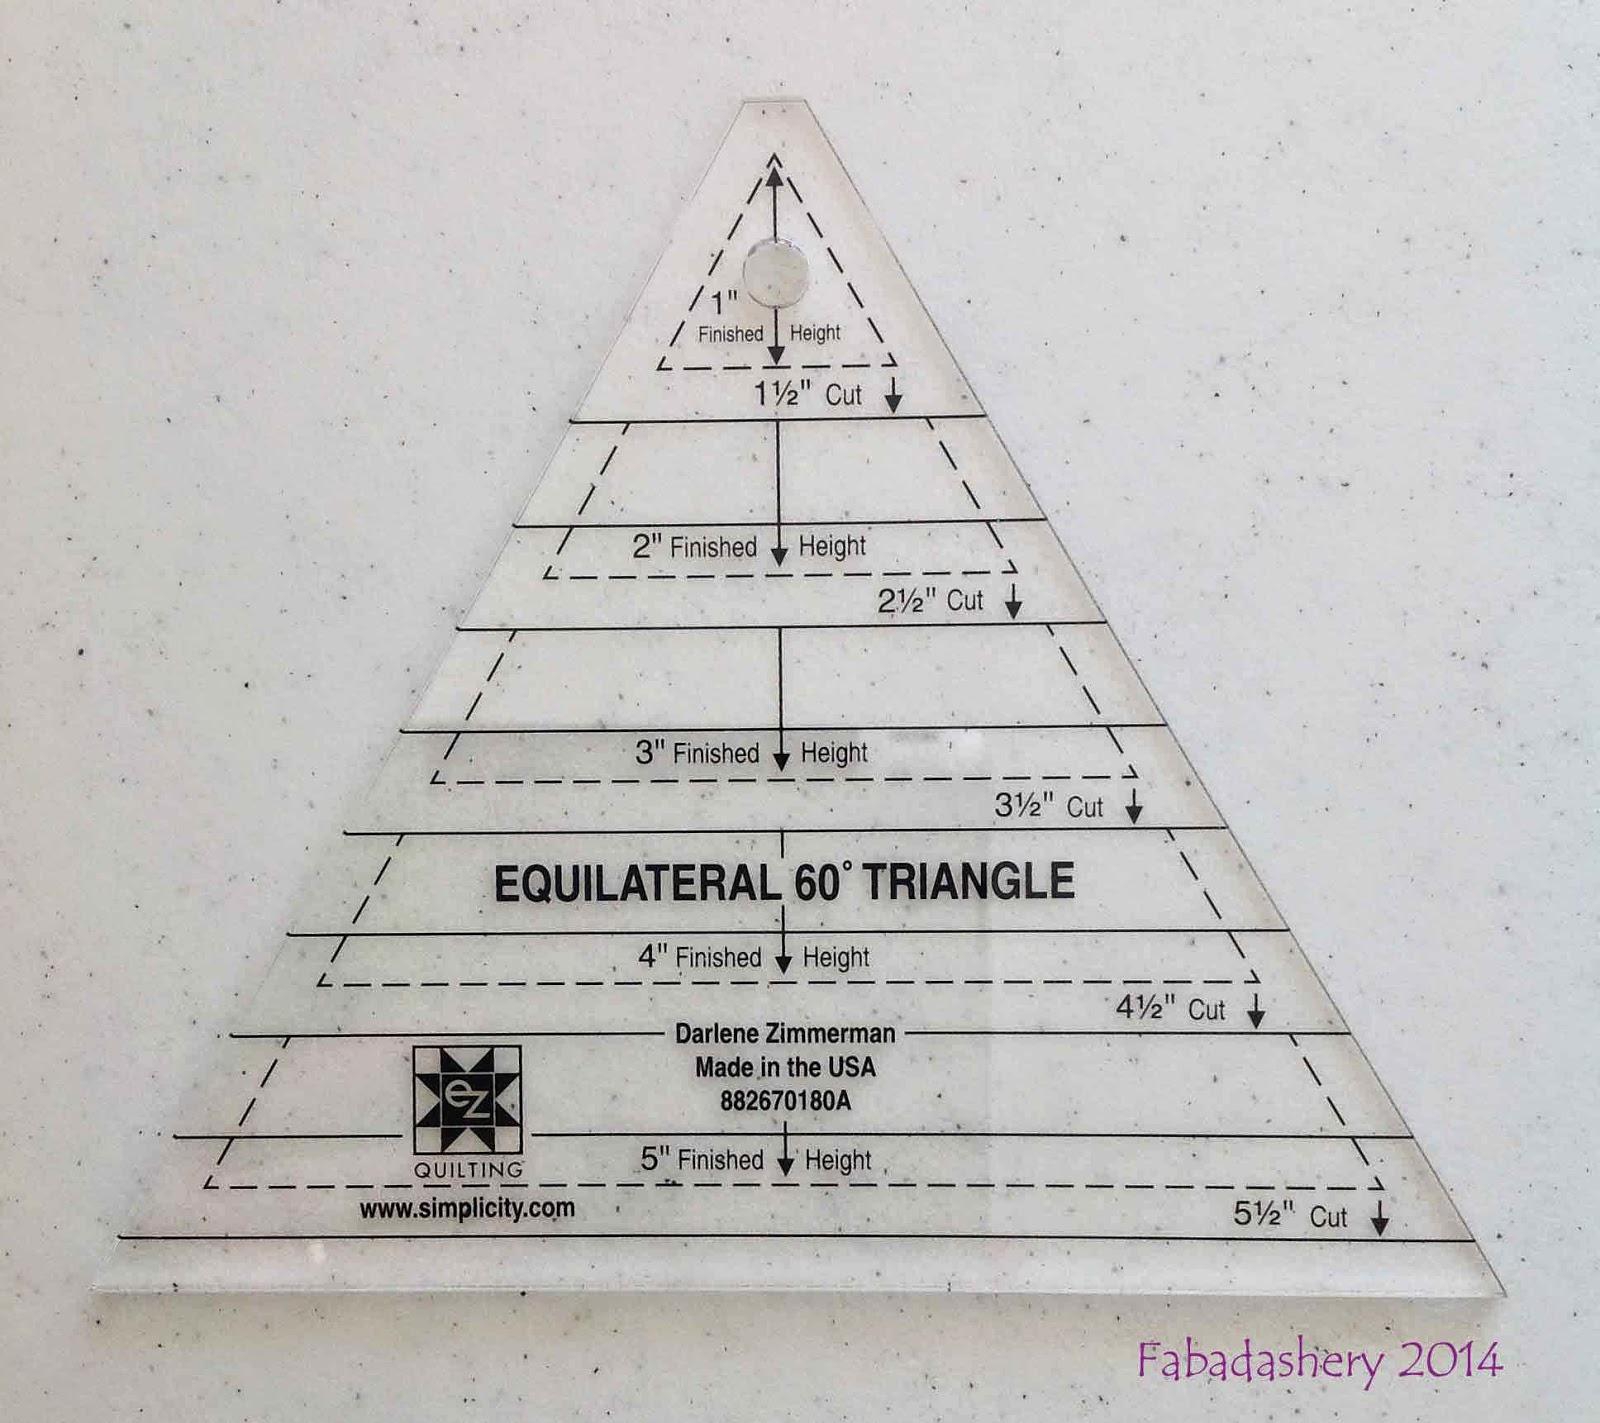 EZ Quilting 60 degree Triangle designed by Darlene Zimmerman